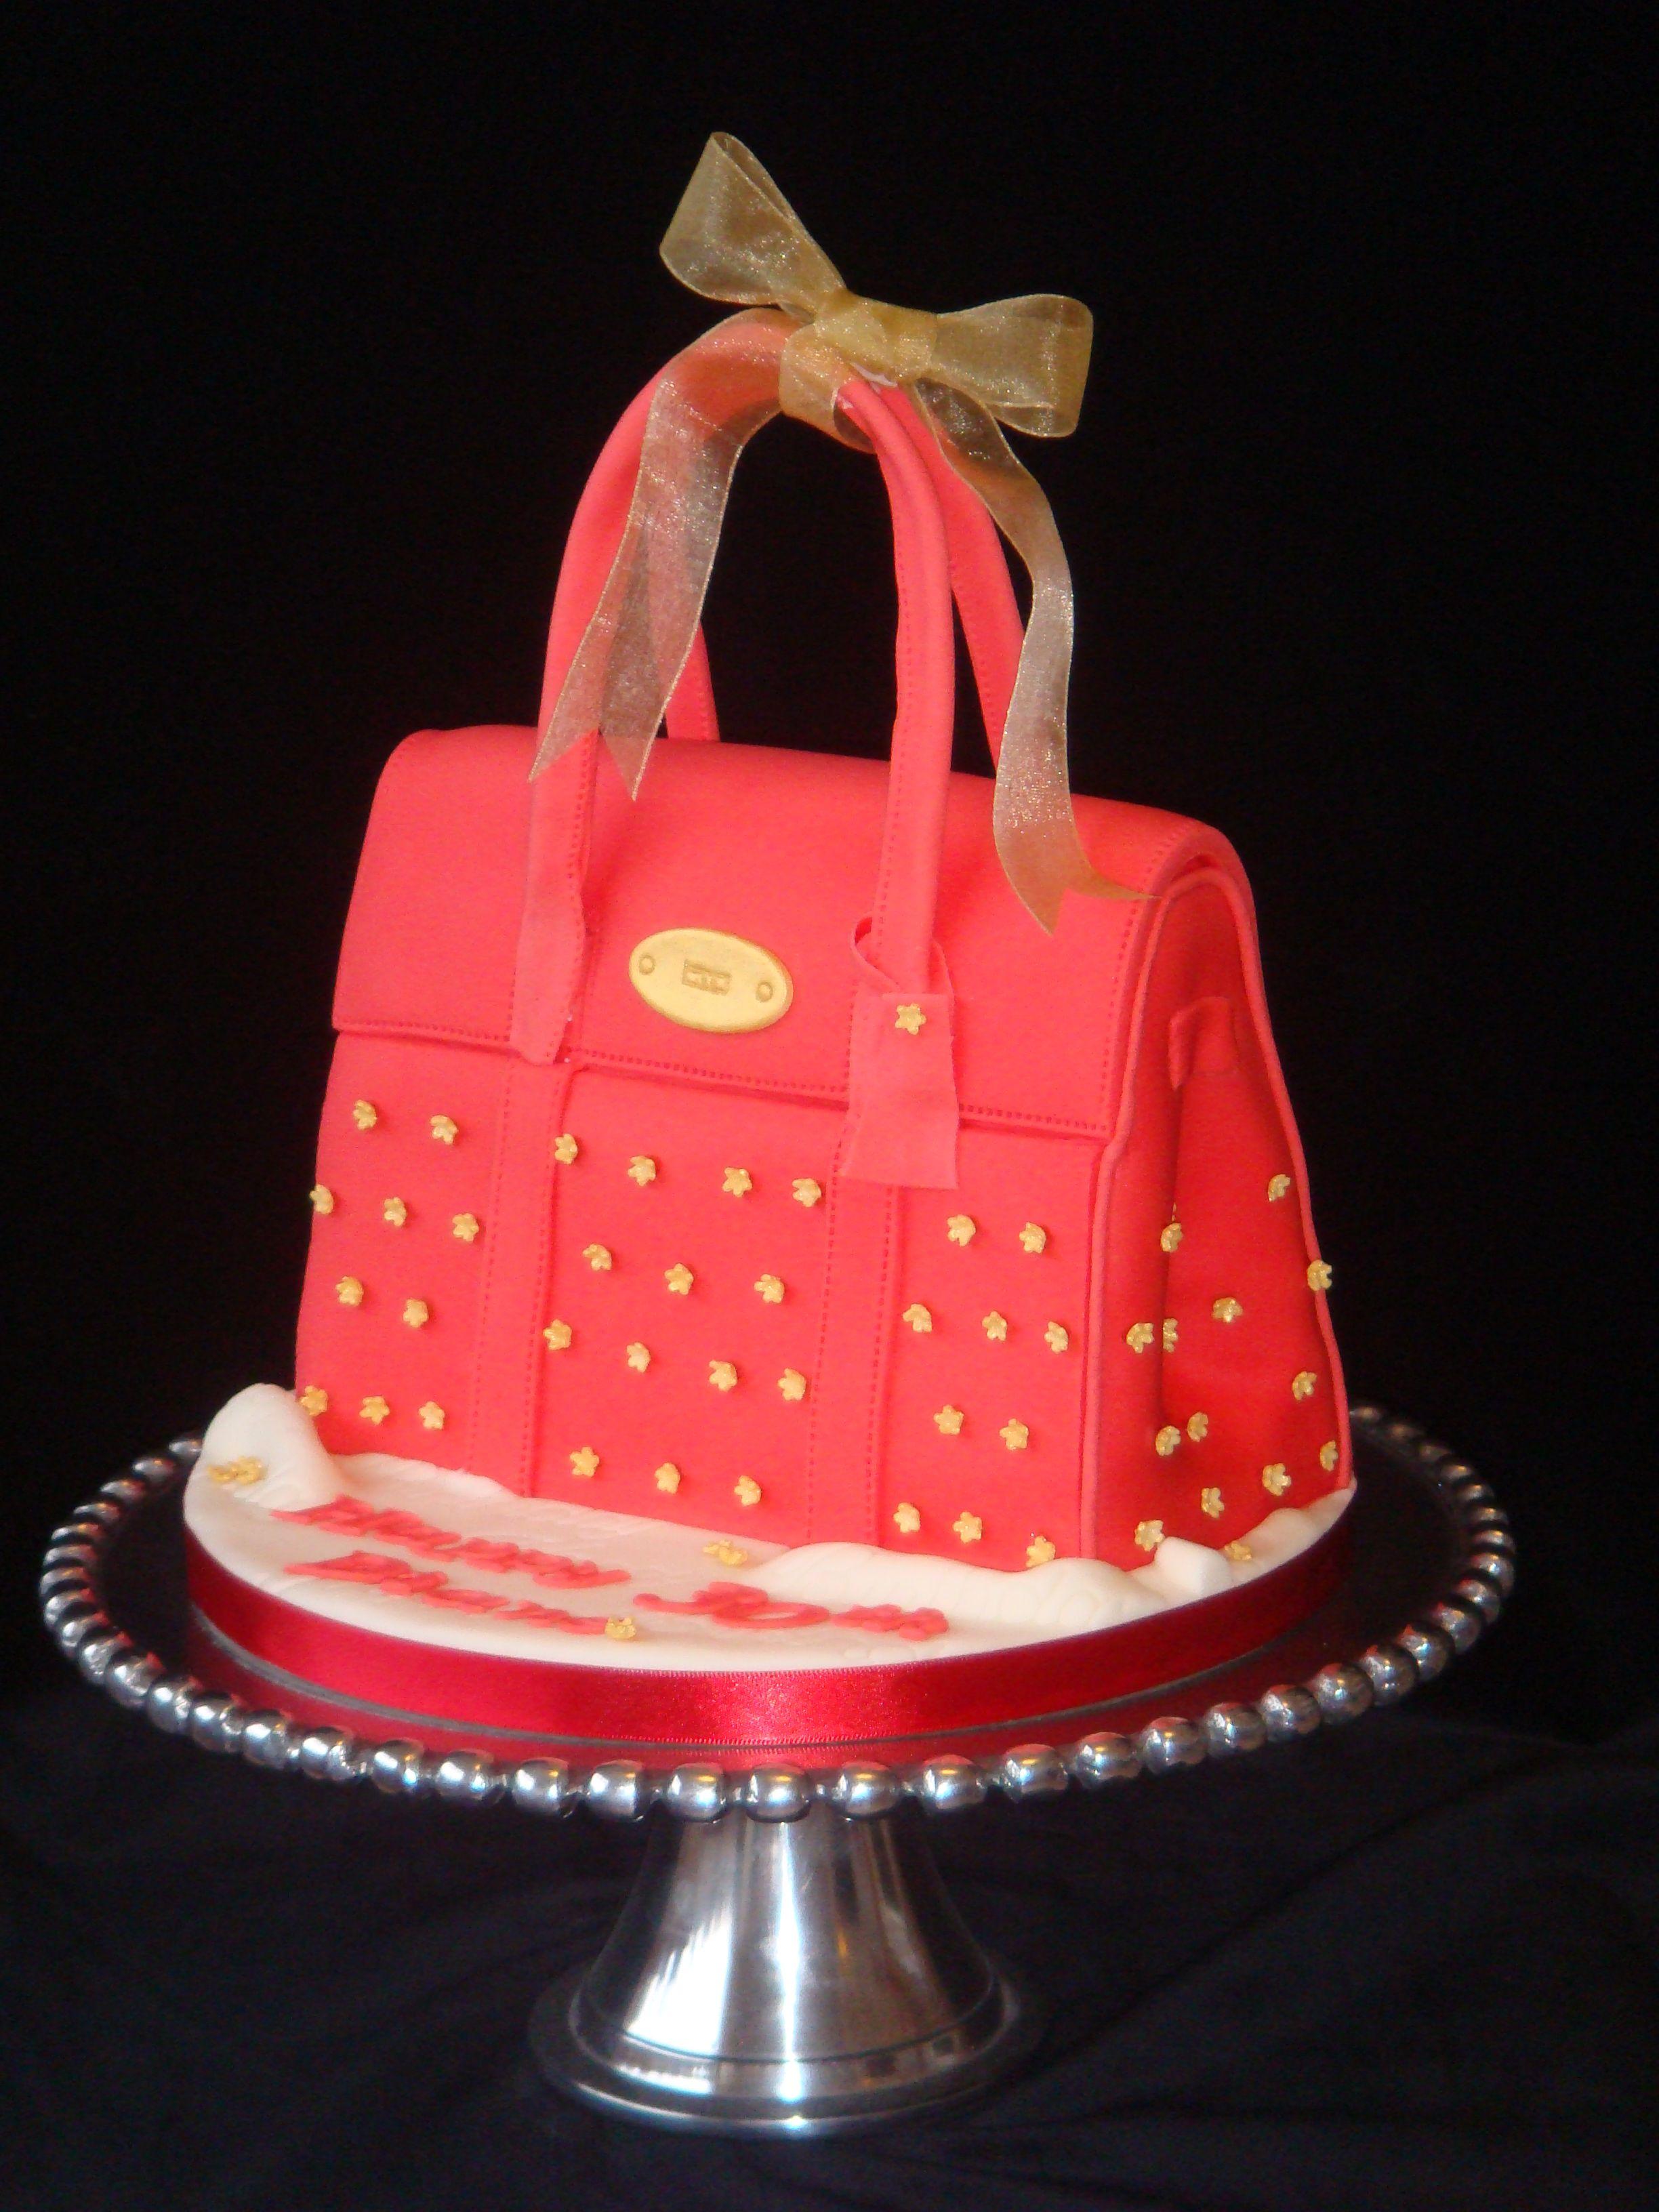 Red Handbag Birthday Cake Celebration Cakes From Broughty Cake